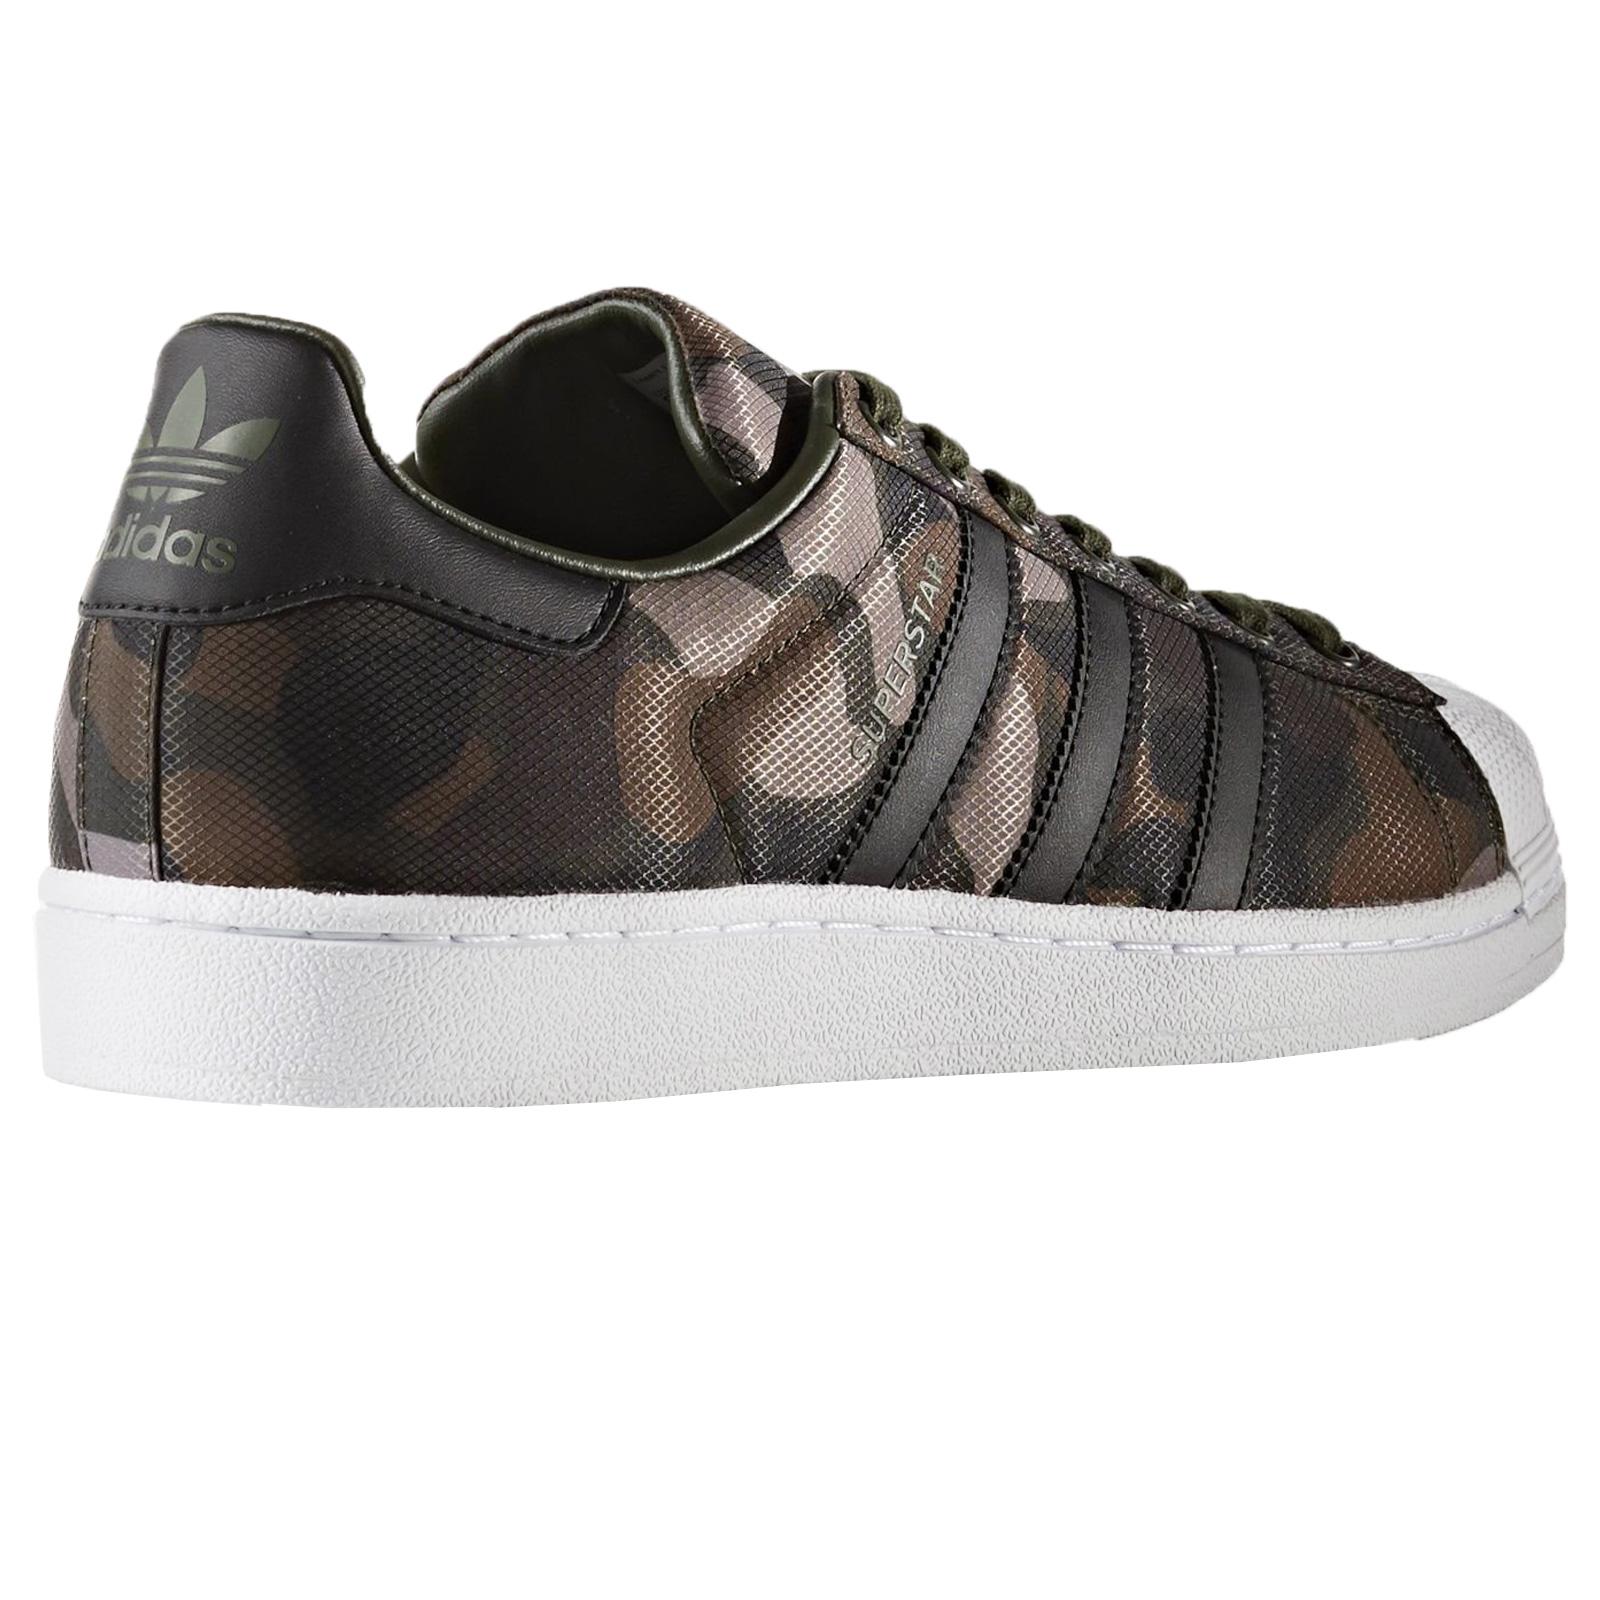 adidas Originals Superstar Camo Camouflage Sneaker BZ0189 Turnschuhe Schuhe